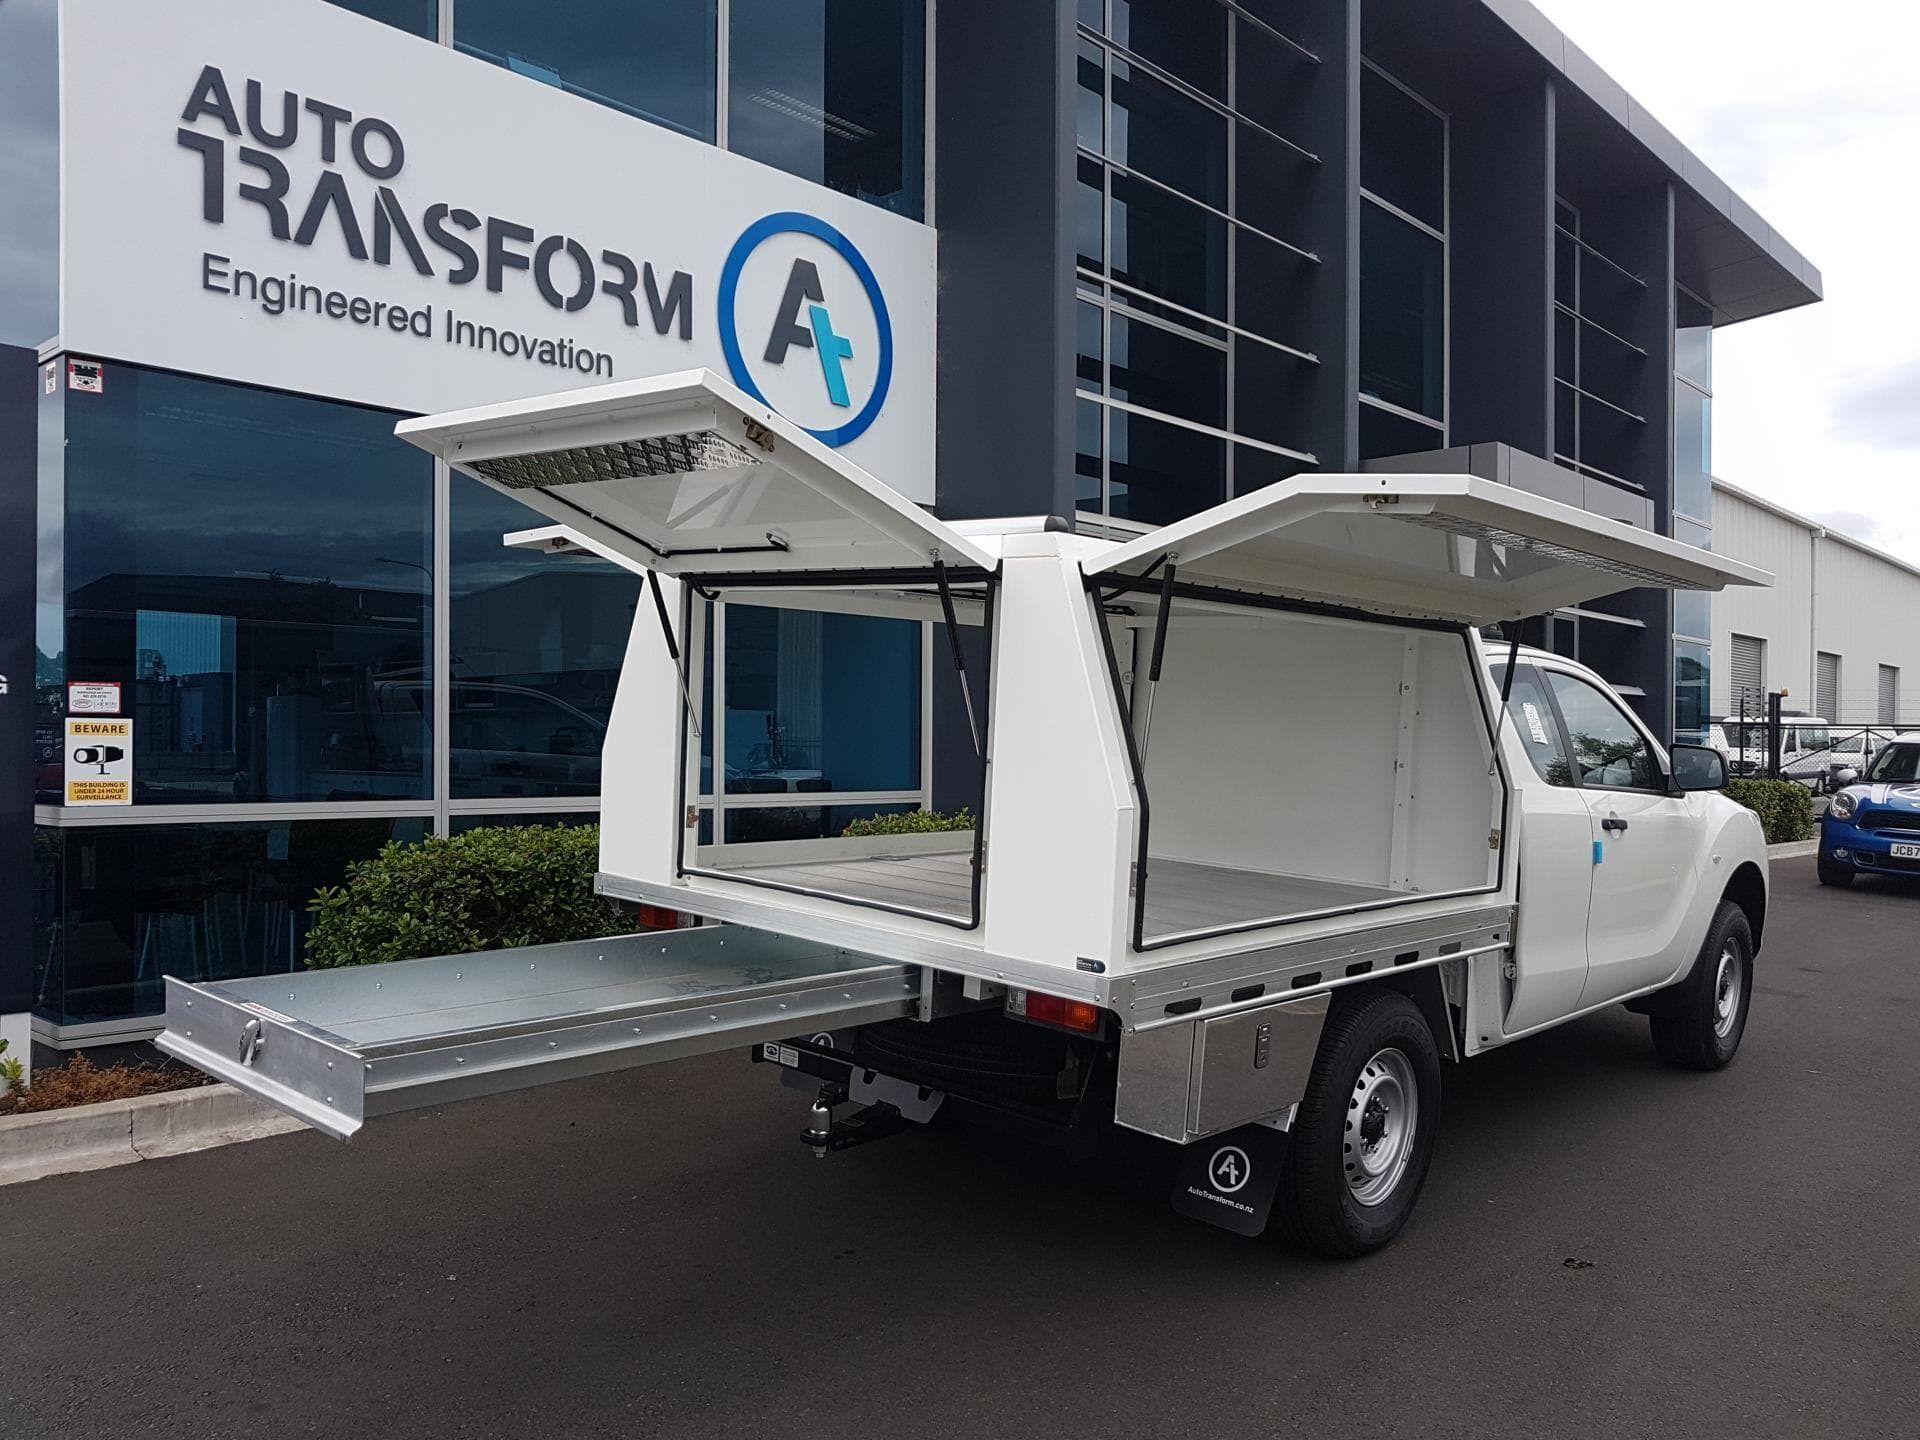 Commercial ute service body with open doors